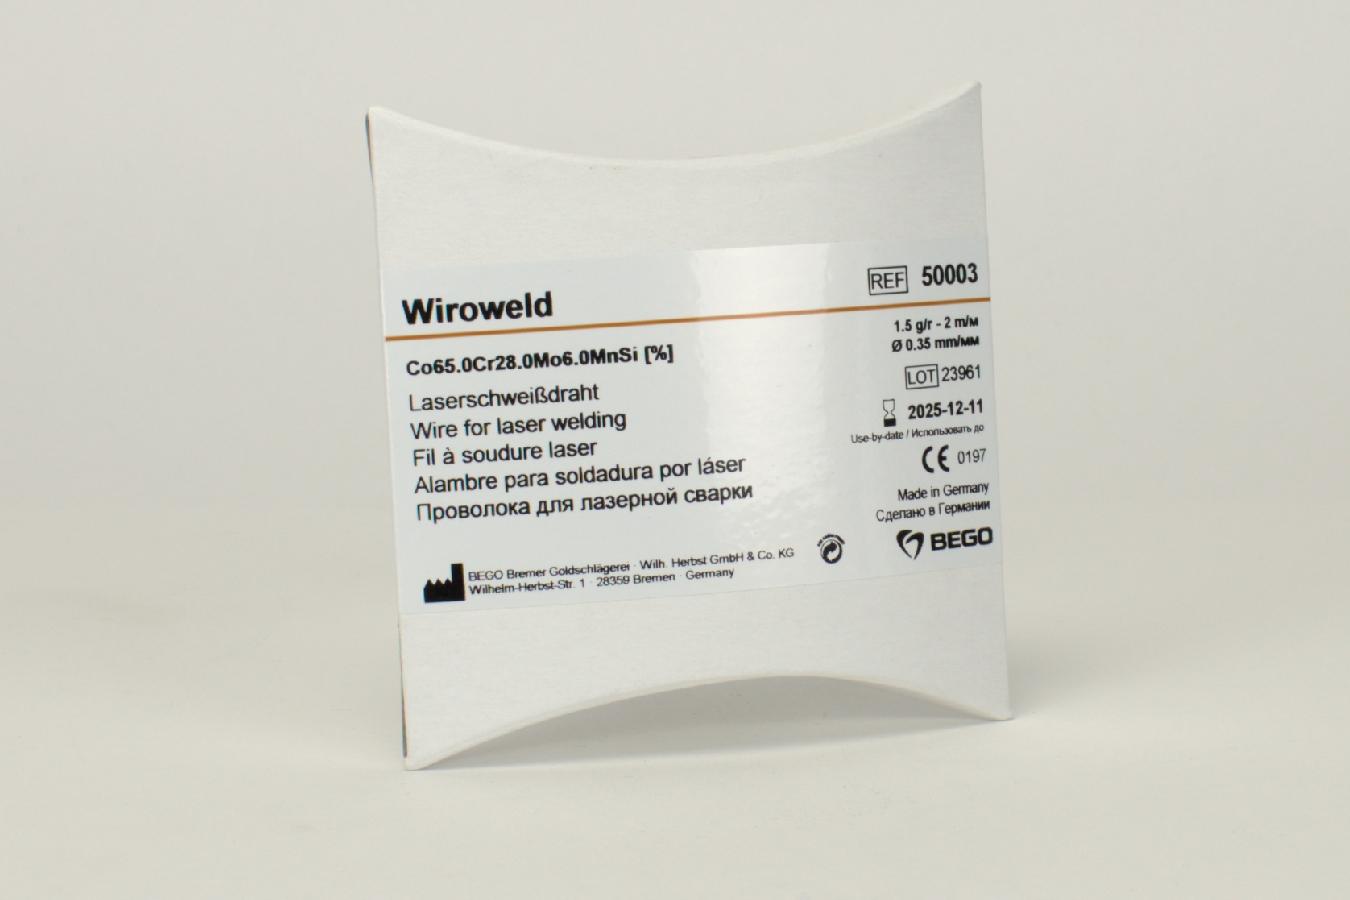 Wiroweld Draht 0,35mm 2,0Mtr Rl